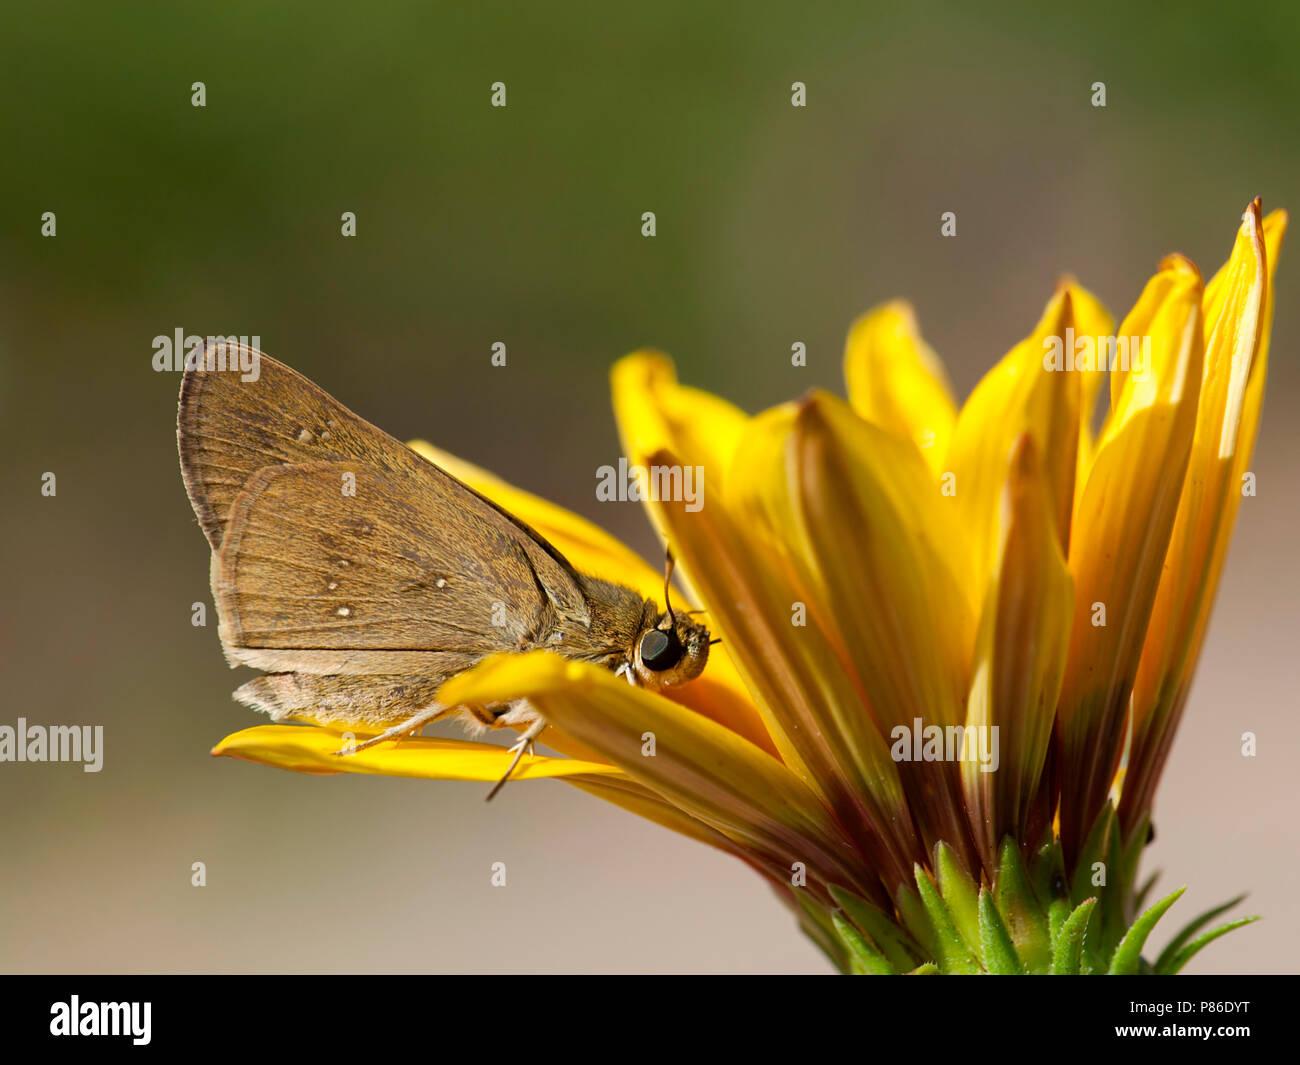 Gierstdikkopje / Millet Skipper (Pelopidas thrax) - Stock Image